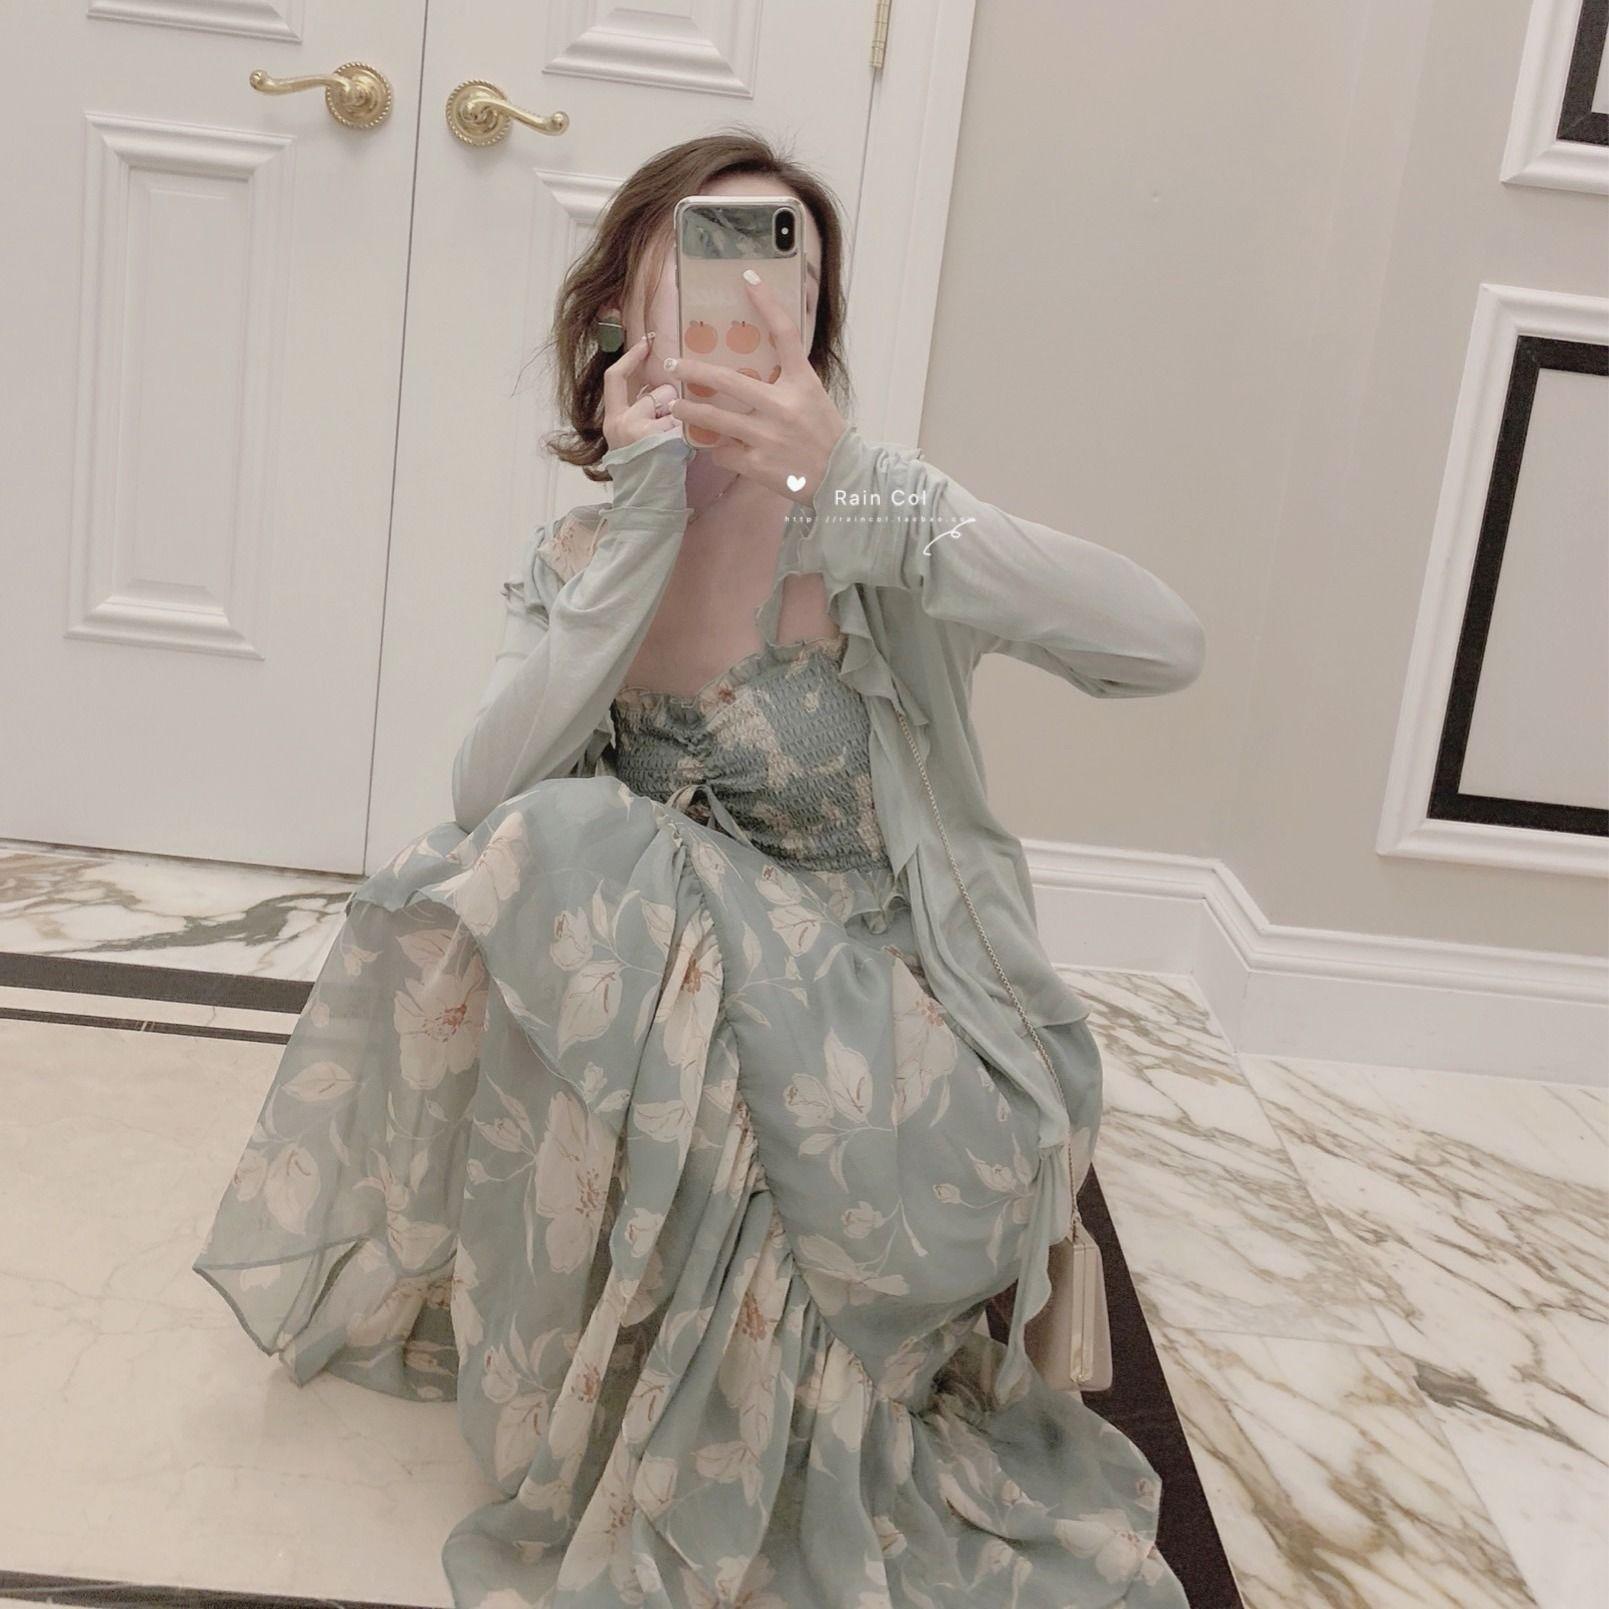 2021 new chiffon skirt Korean summer lotus lace suspender dress super Fairy Dress